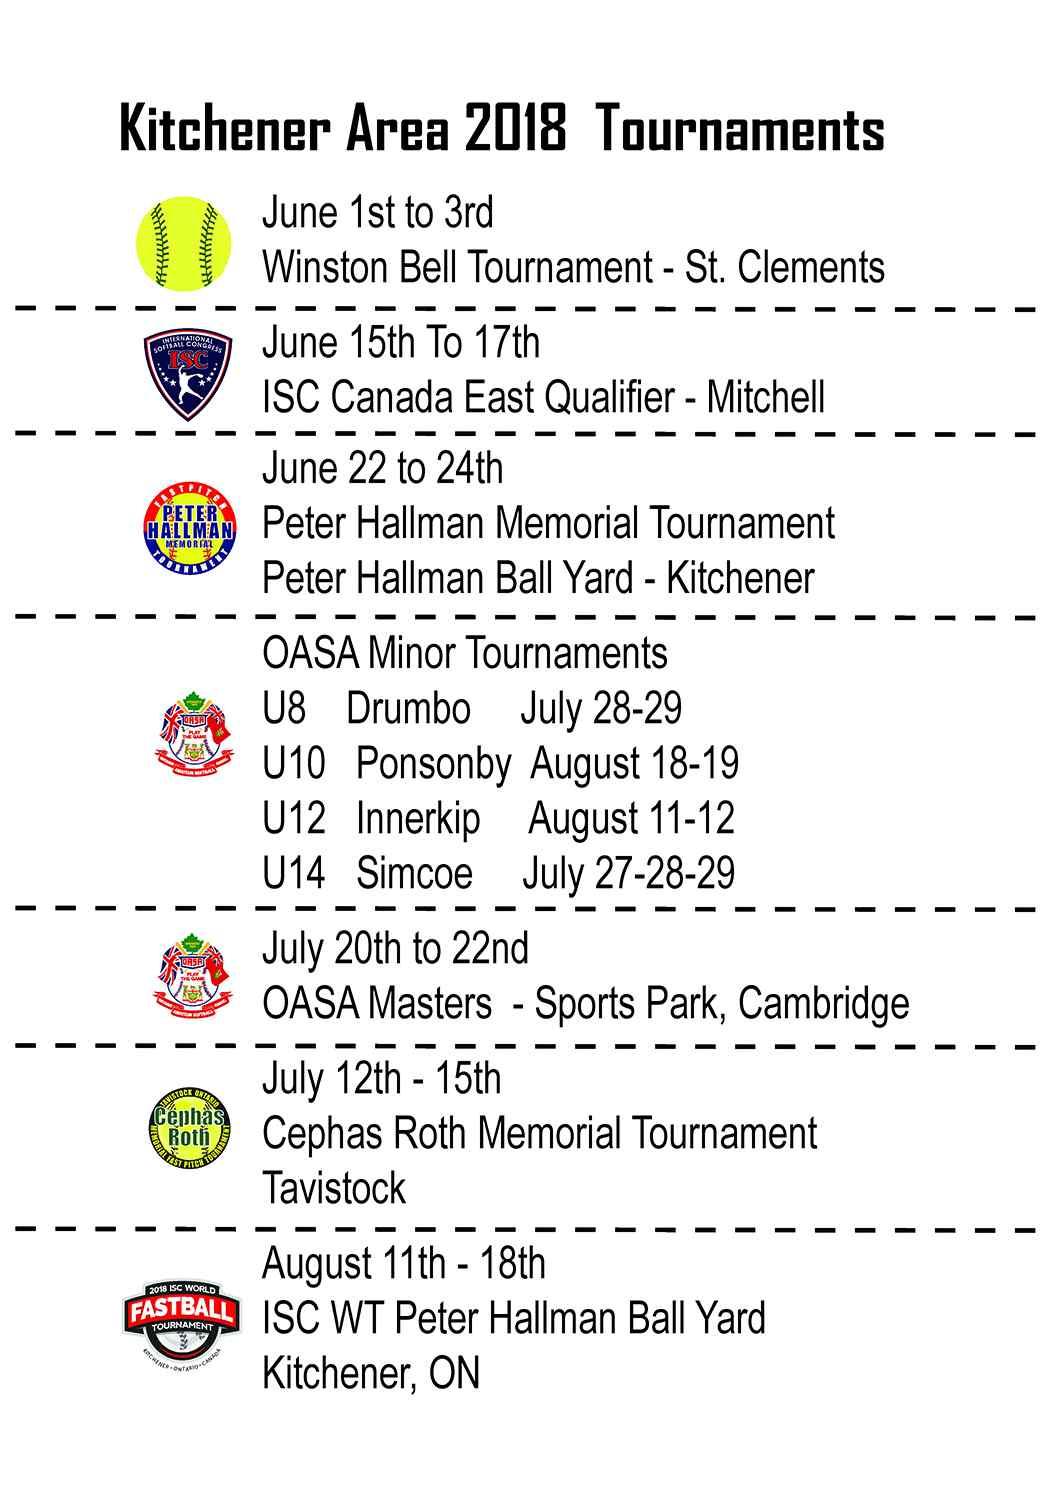 Tournament Schedule in Kitchener/Waterloo